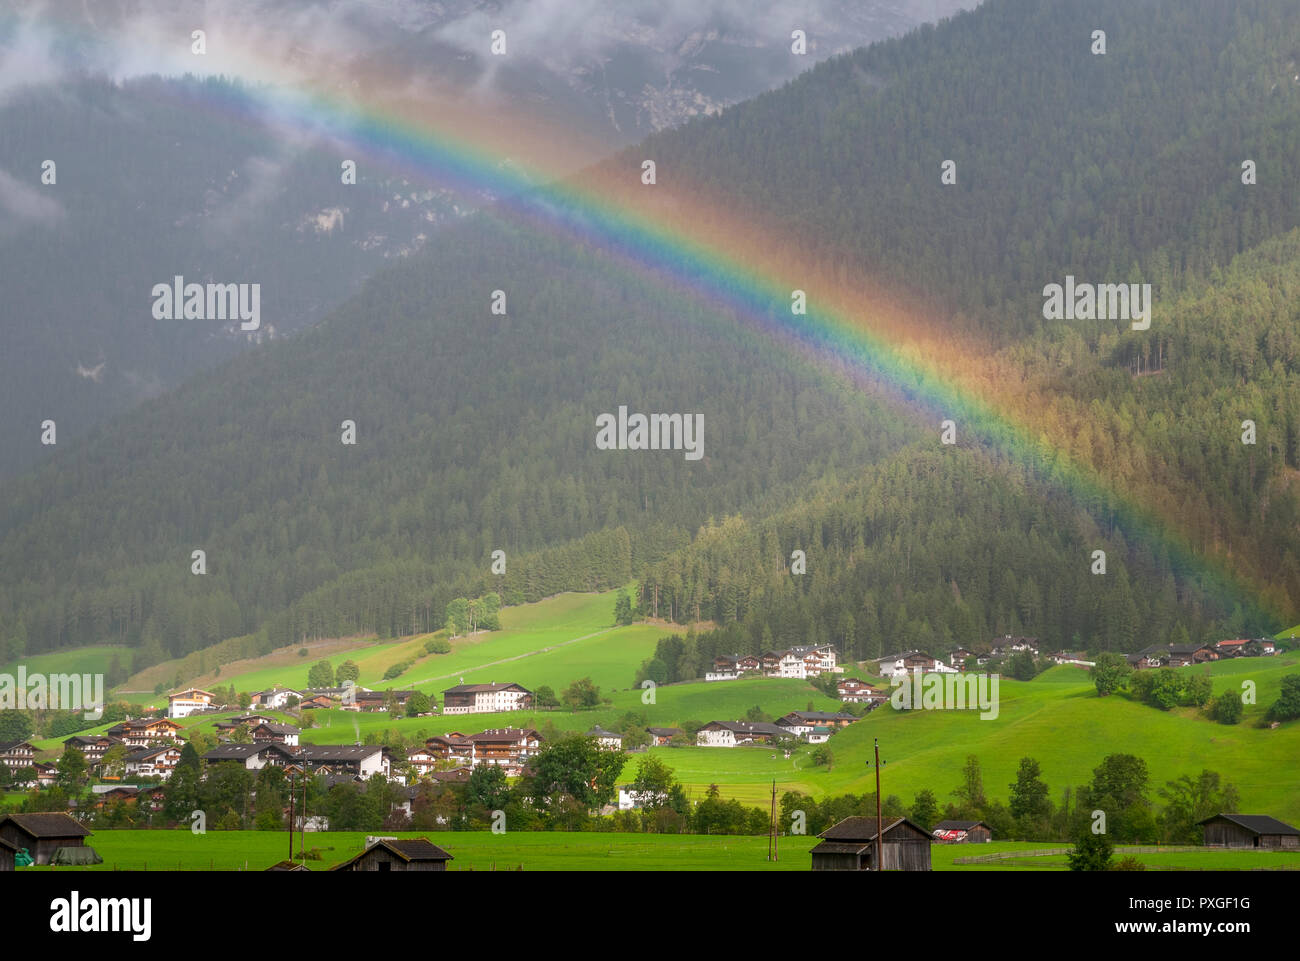 Rainbow Photographed in Neustift im Stubaital, Tyrol, Austria - Stock Image